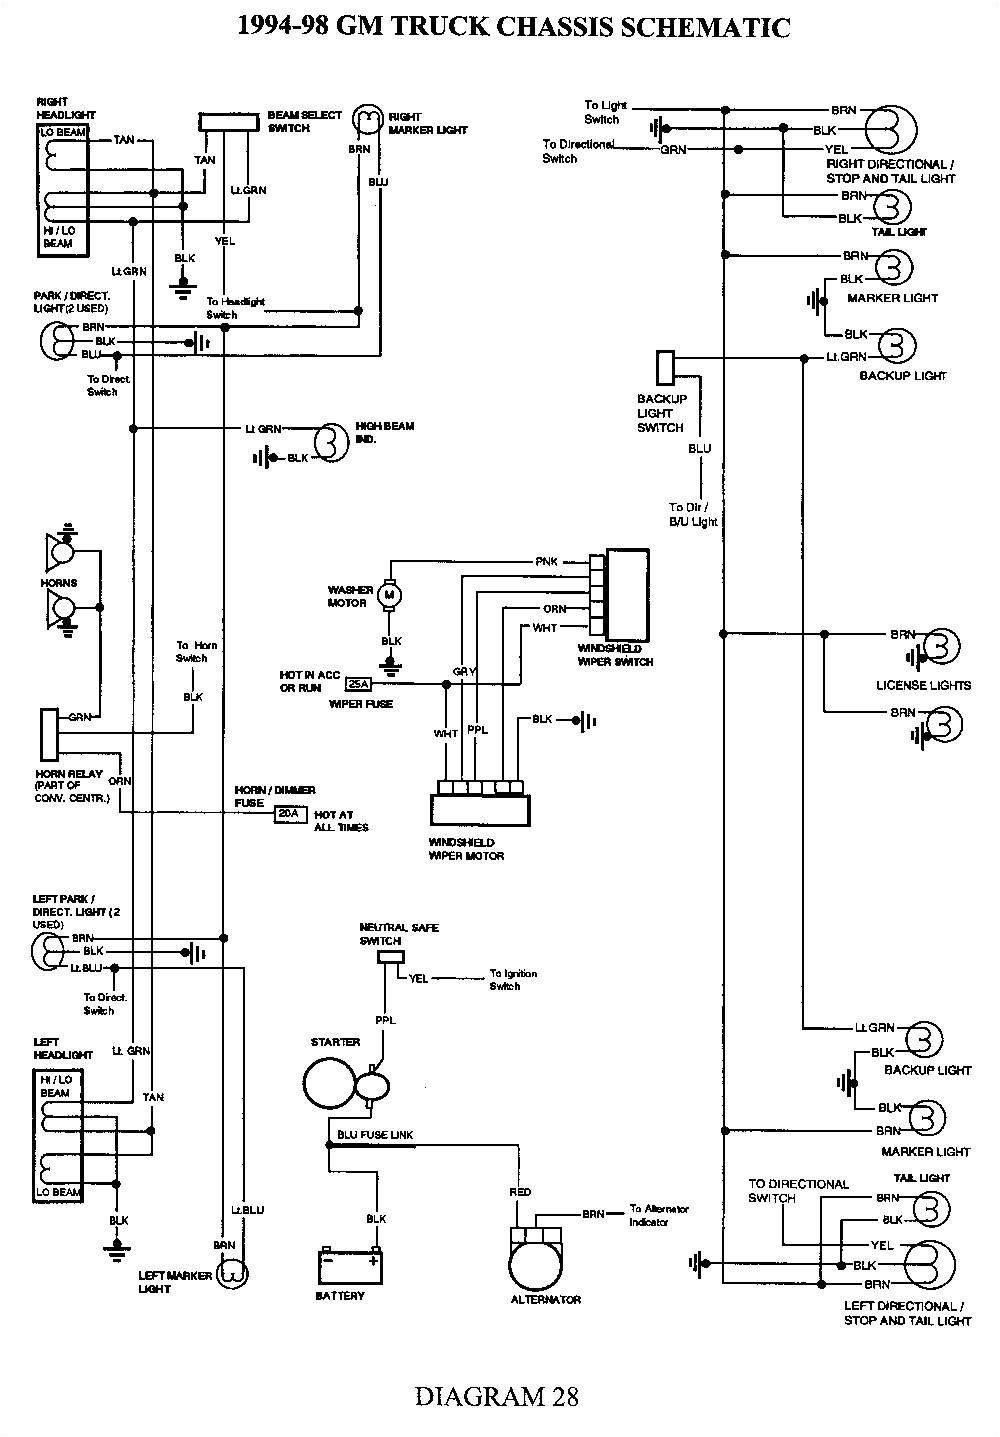 2500hd fog light wiring on tail light wiring 2008 chevy silverado chevy tail light wiring diagram free picture